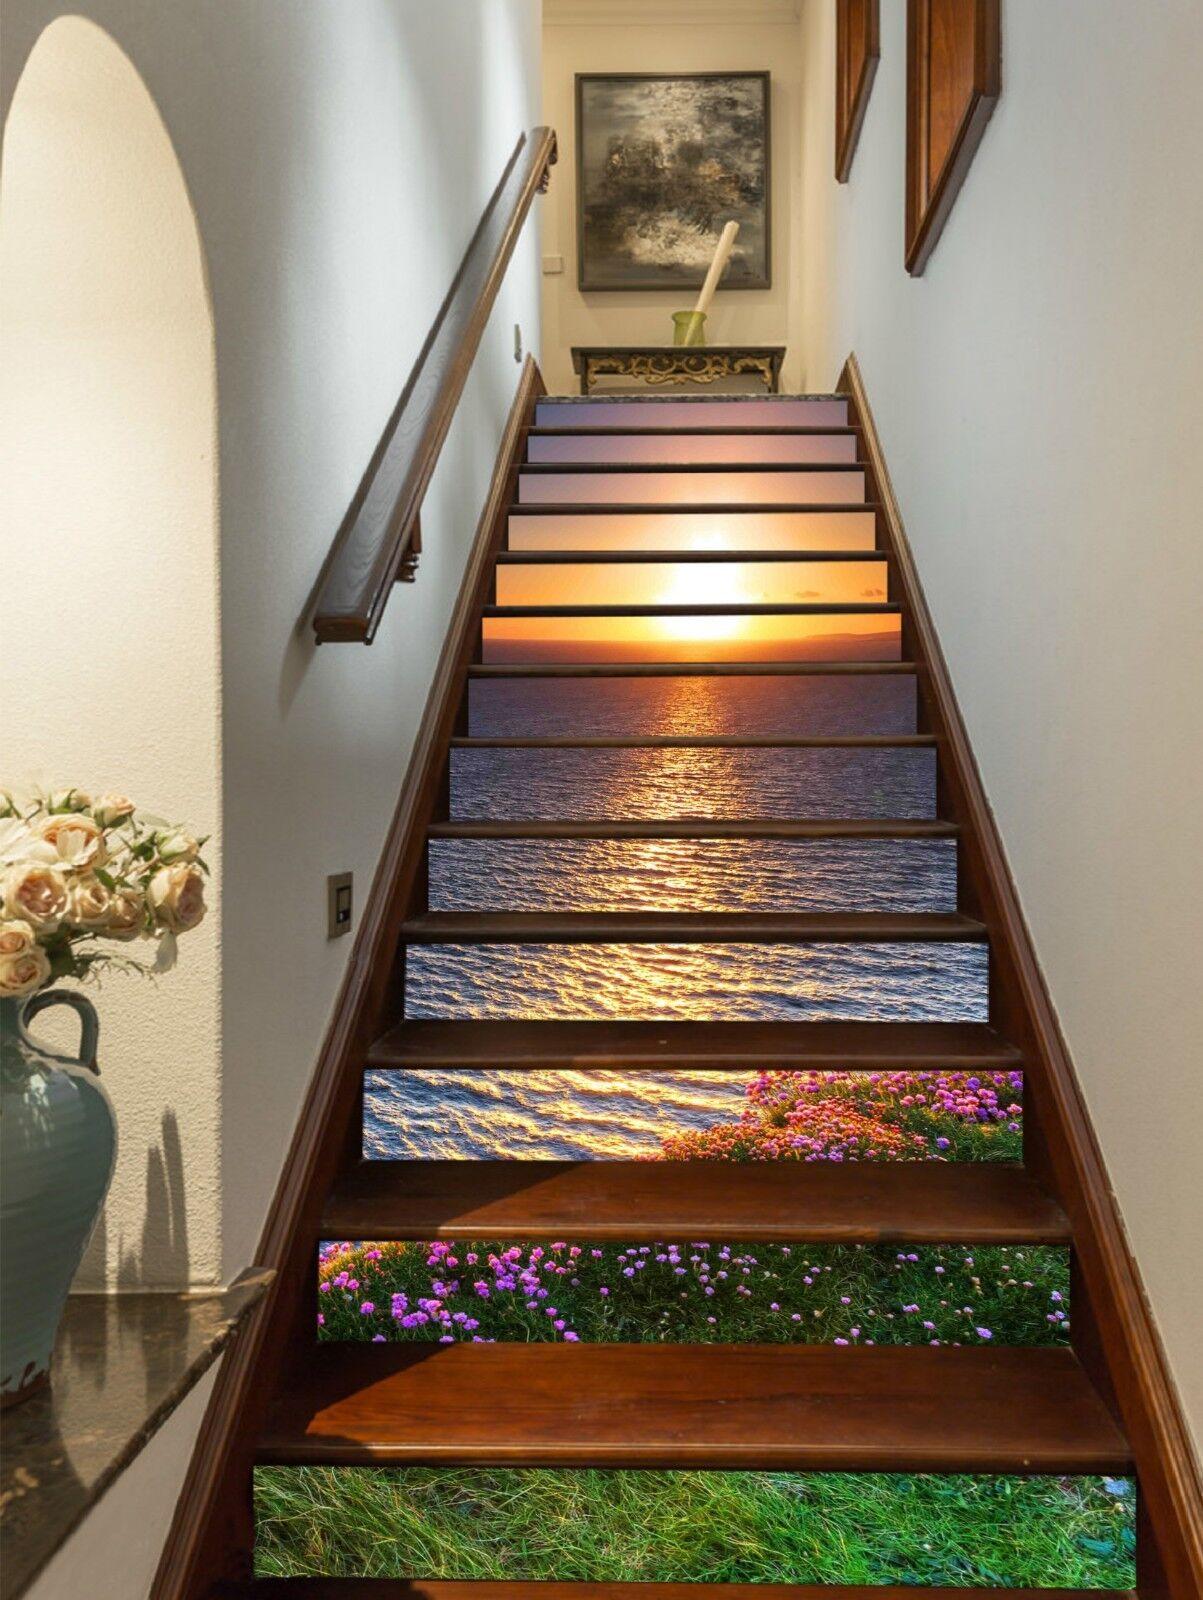 3D Sunset River 2 Stair Risers Decoration Photo Mural Vinyl Decal Wallpaper CA